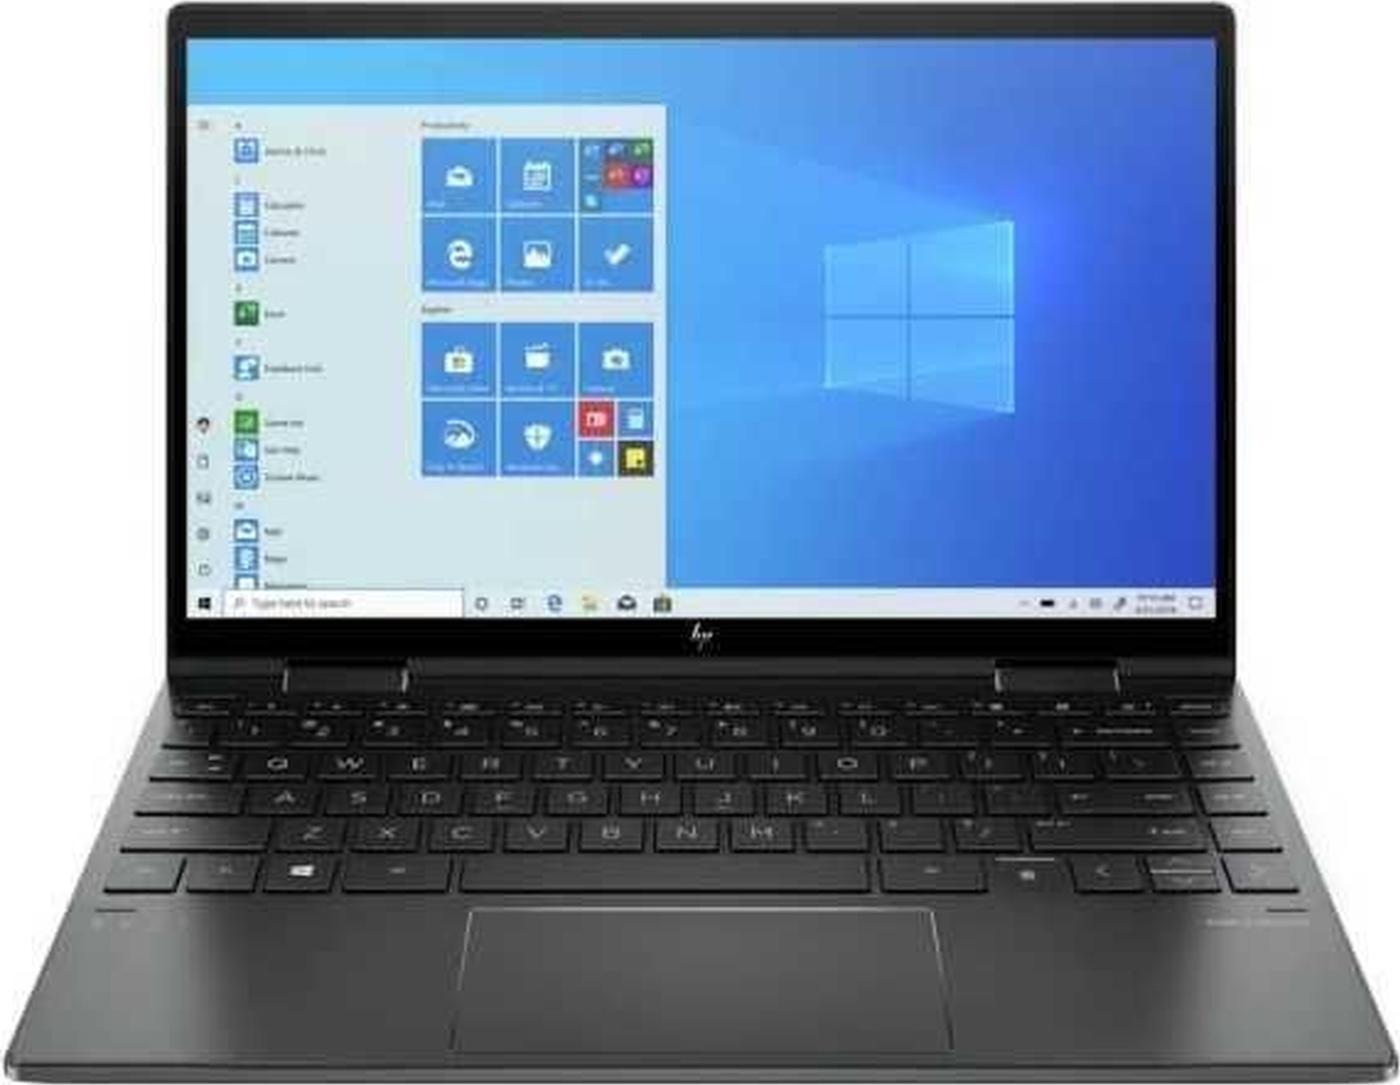 "13.3"" ноутбук hp envy x360 13-ay0039ur, amd ryzen 5 4500u (2.3 ггц), ram16 гб, ssd amd radeon, windows 10 home, (2x0h9ea), черный"